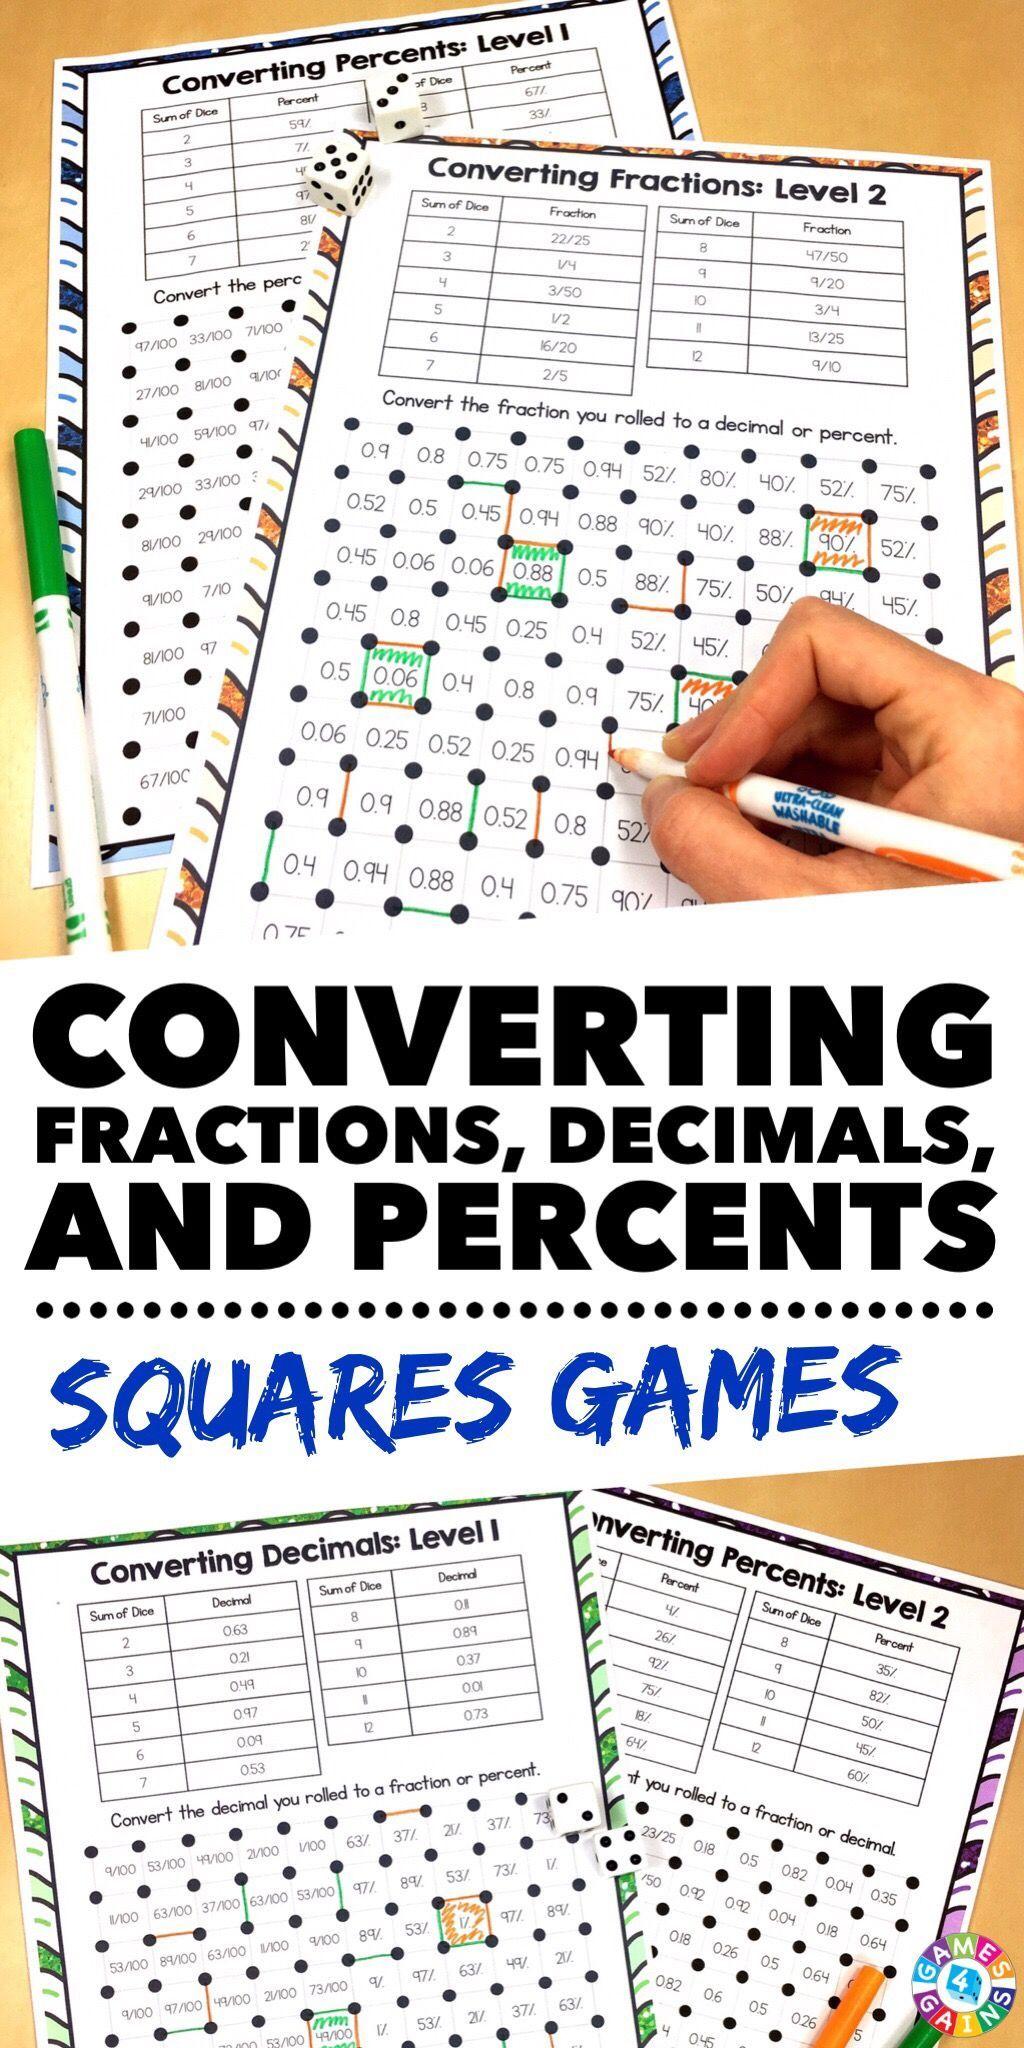 Converting Fractions Decimals And Percents Games 6 Rp 3